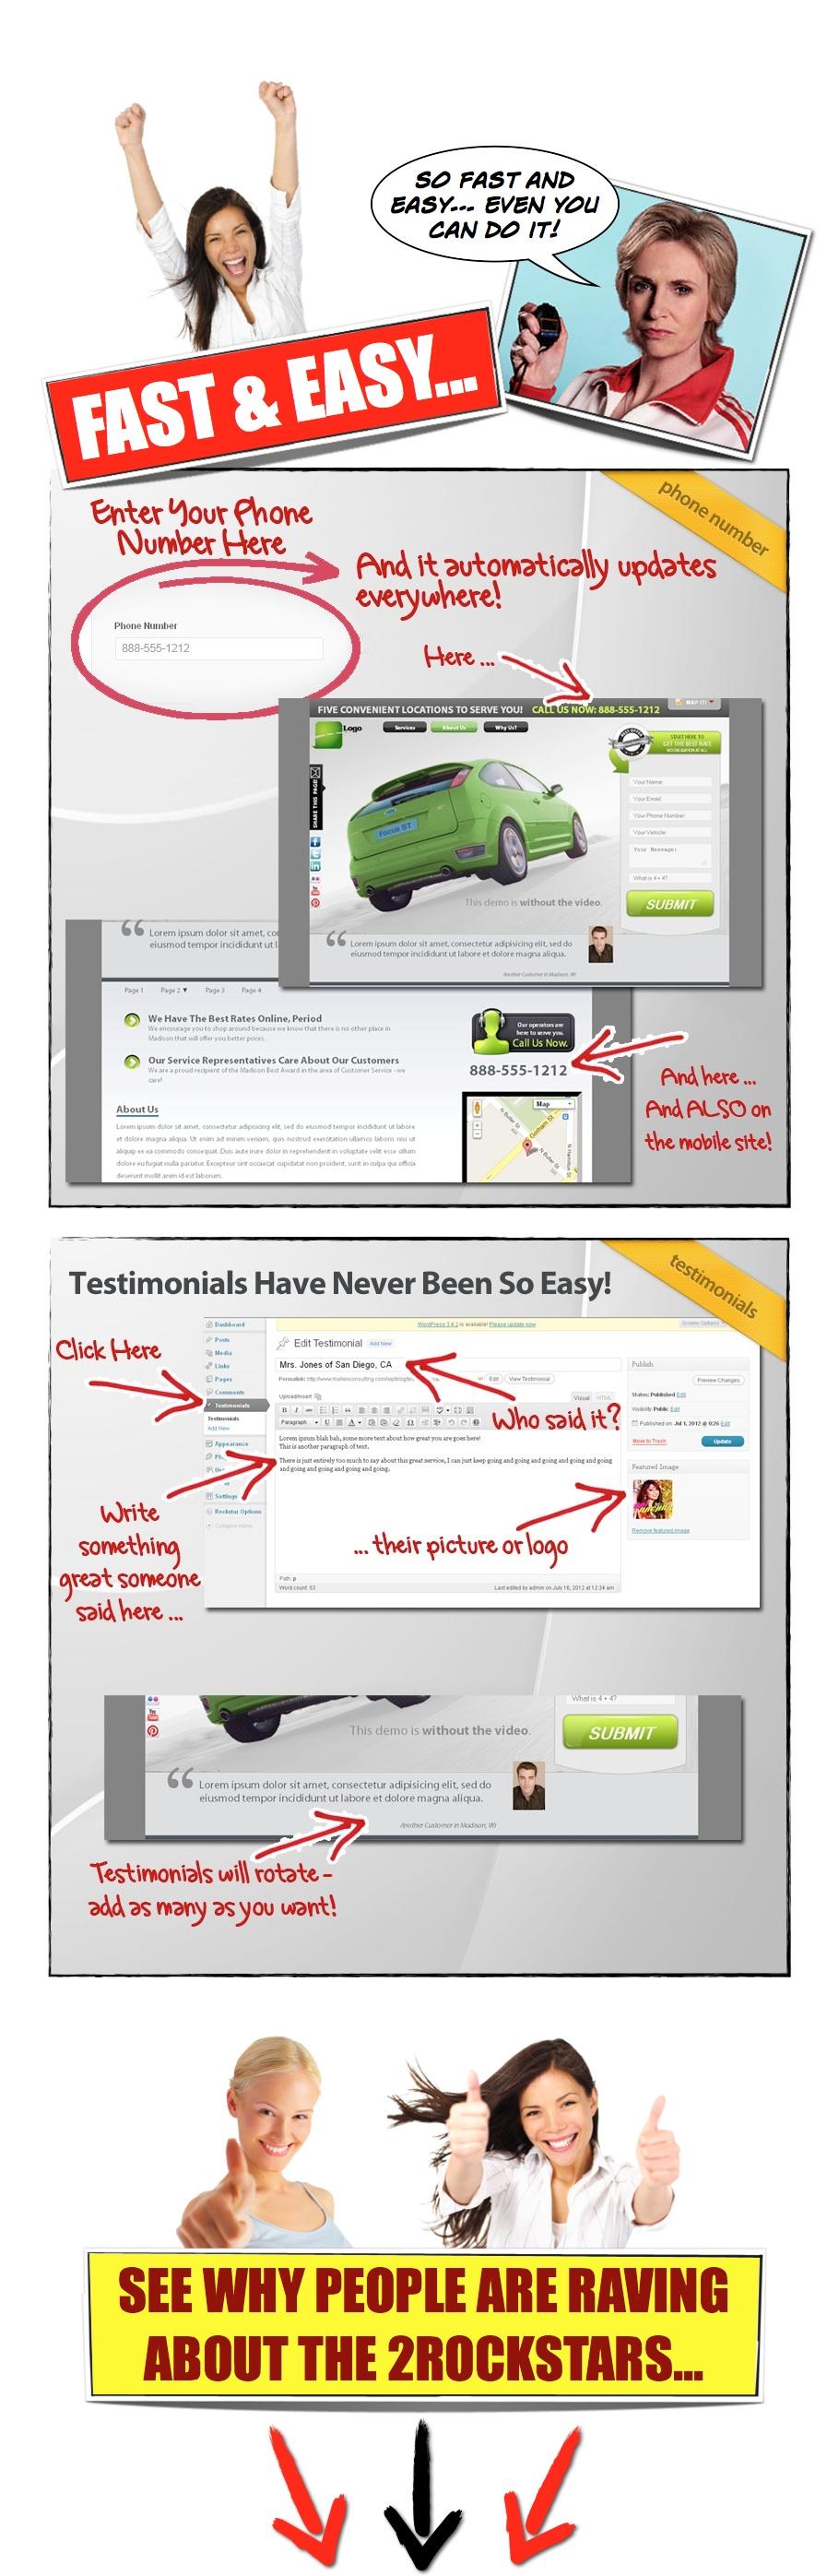 Salespage image 4